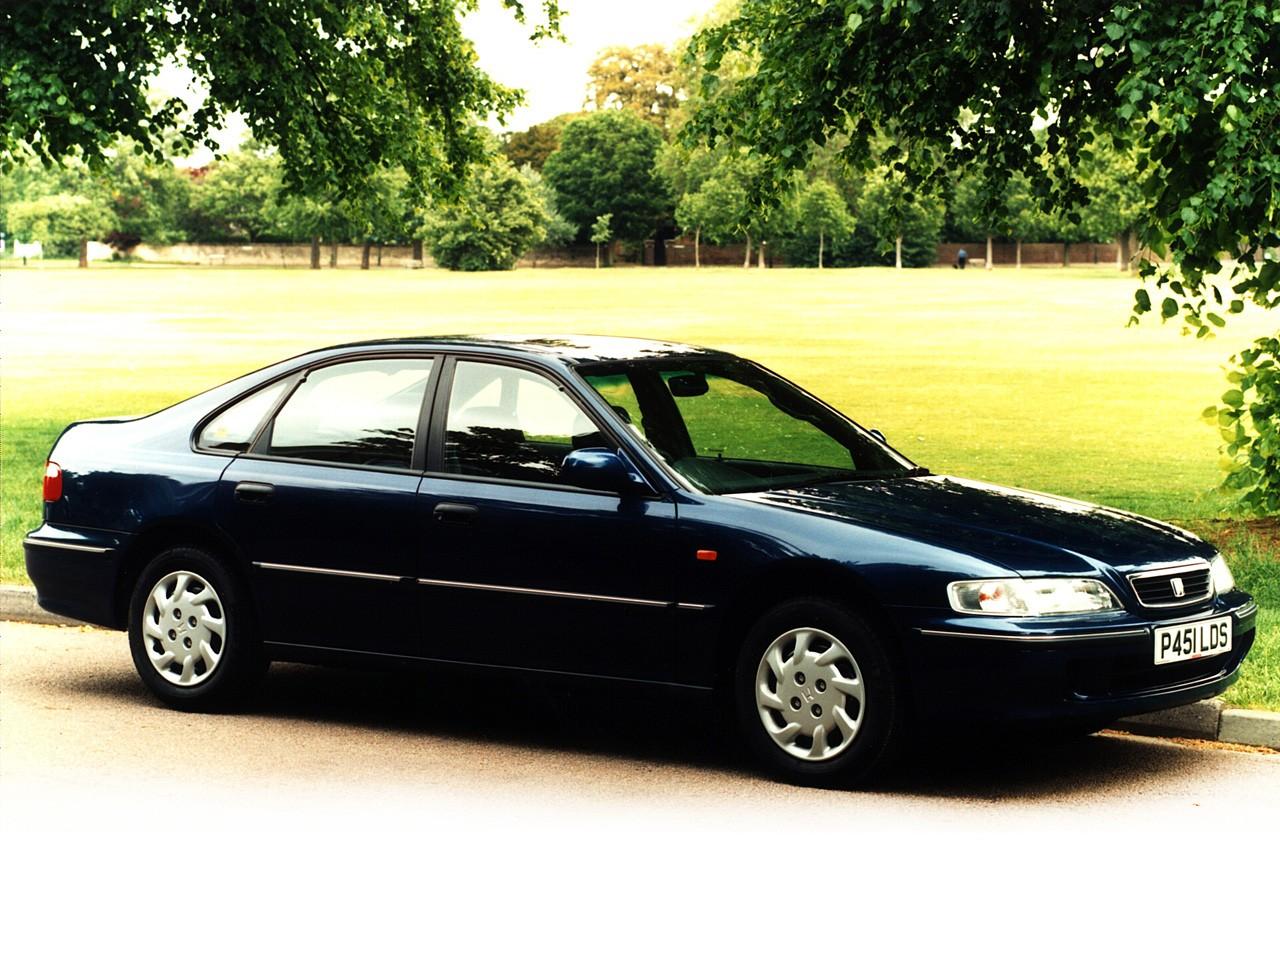 Honda honda accord 1996 : HONDA Accord 4 Doors specs - 1996, 1997, 1998 - autoevolution